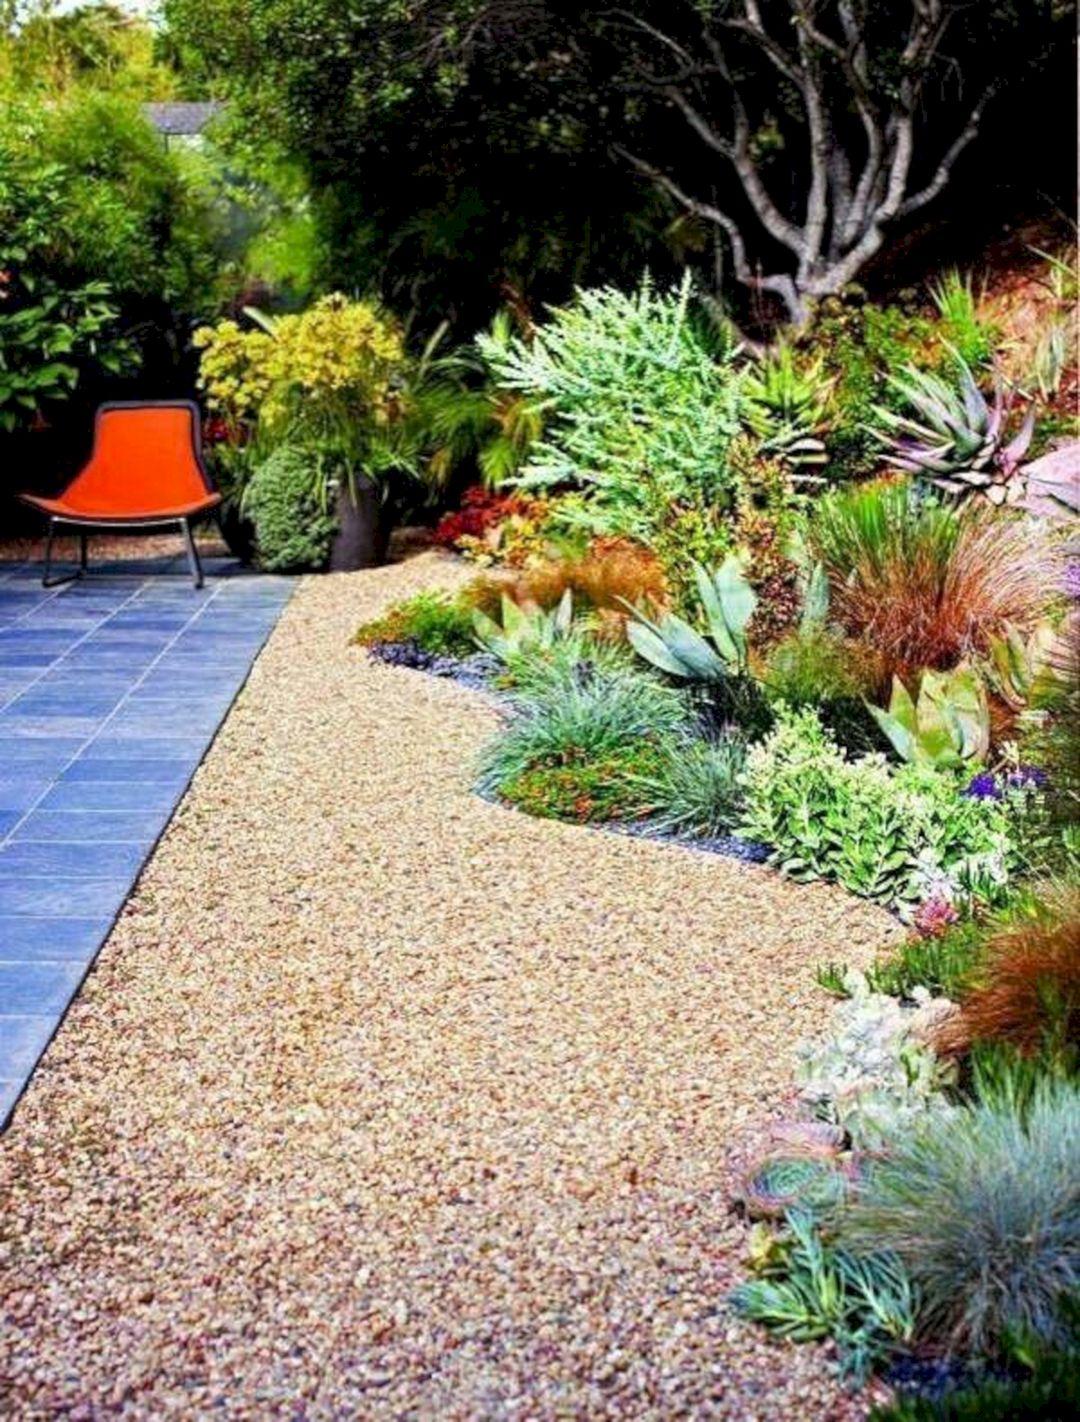 30 Beautiful Desert Garden Design Ideas For Your Backyard ... on Desert Landscape Ideas For Backyards id=19096